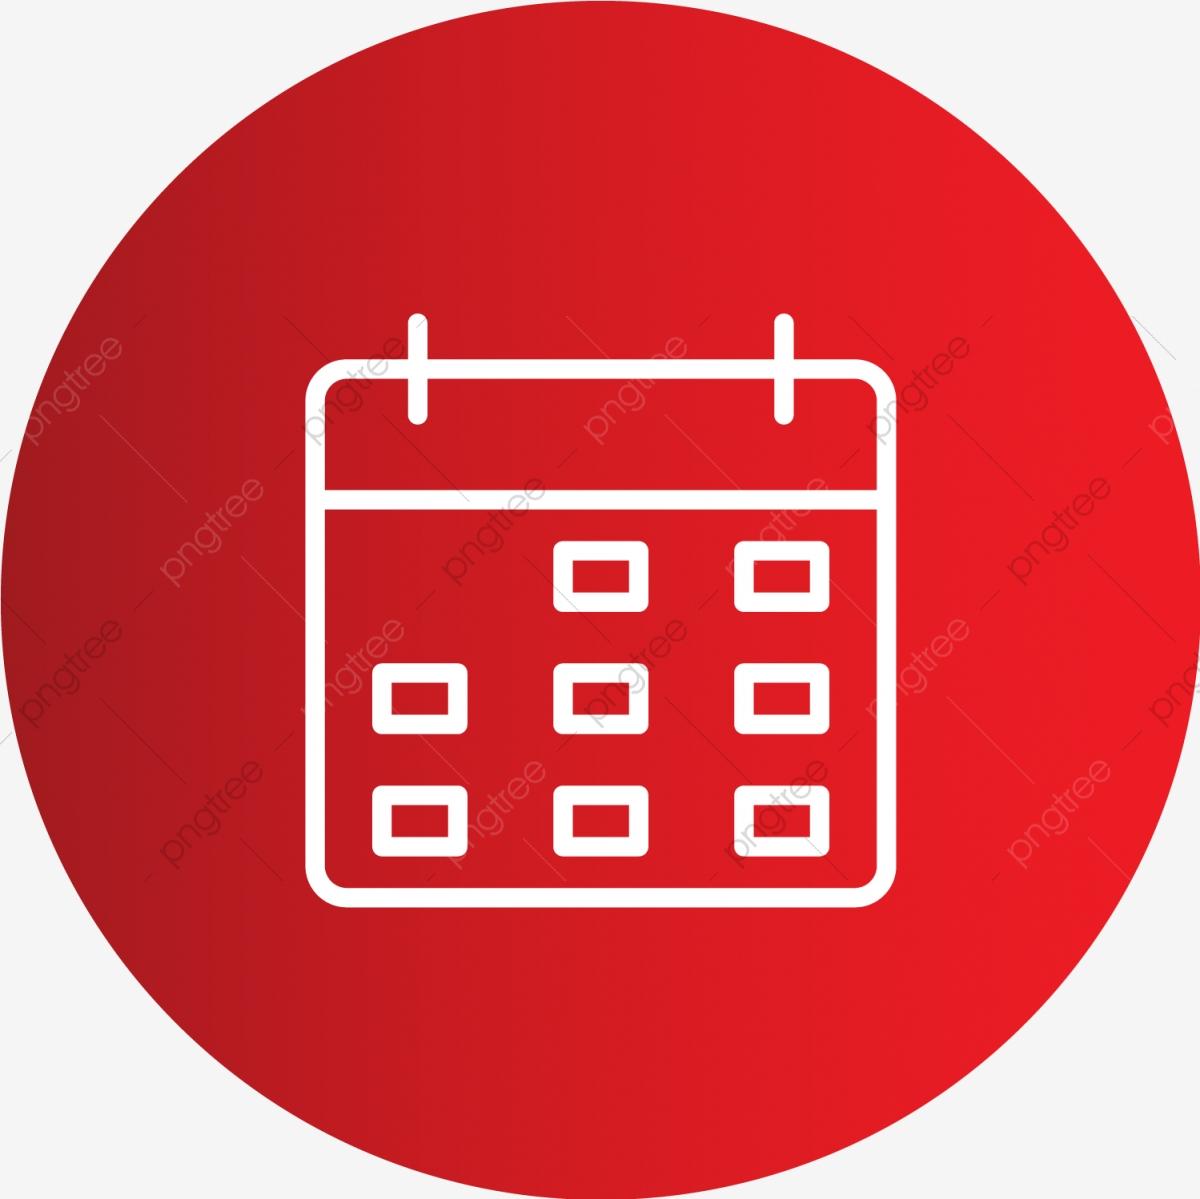 Vector Calendar Icon, Appointment, Calendar, Date Icon Png regarding Red Calendar Icon Png